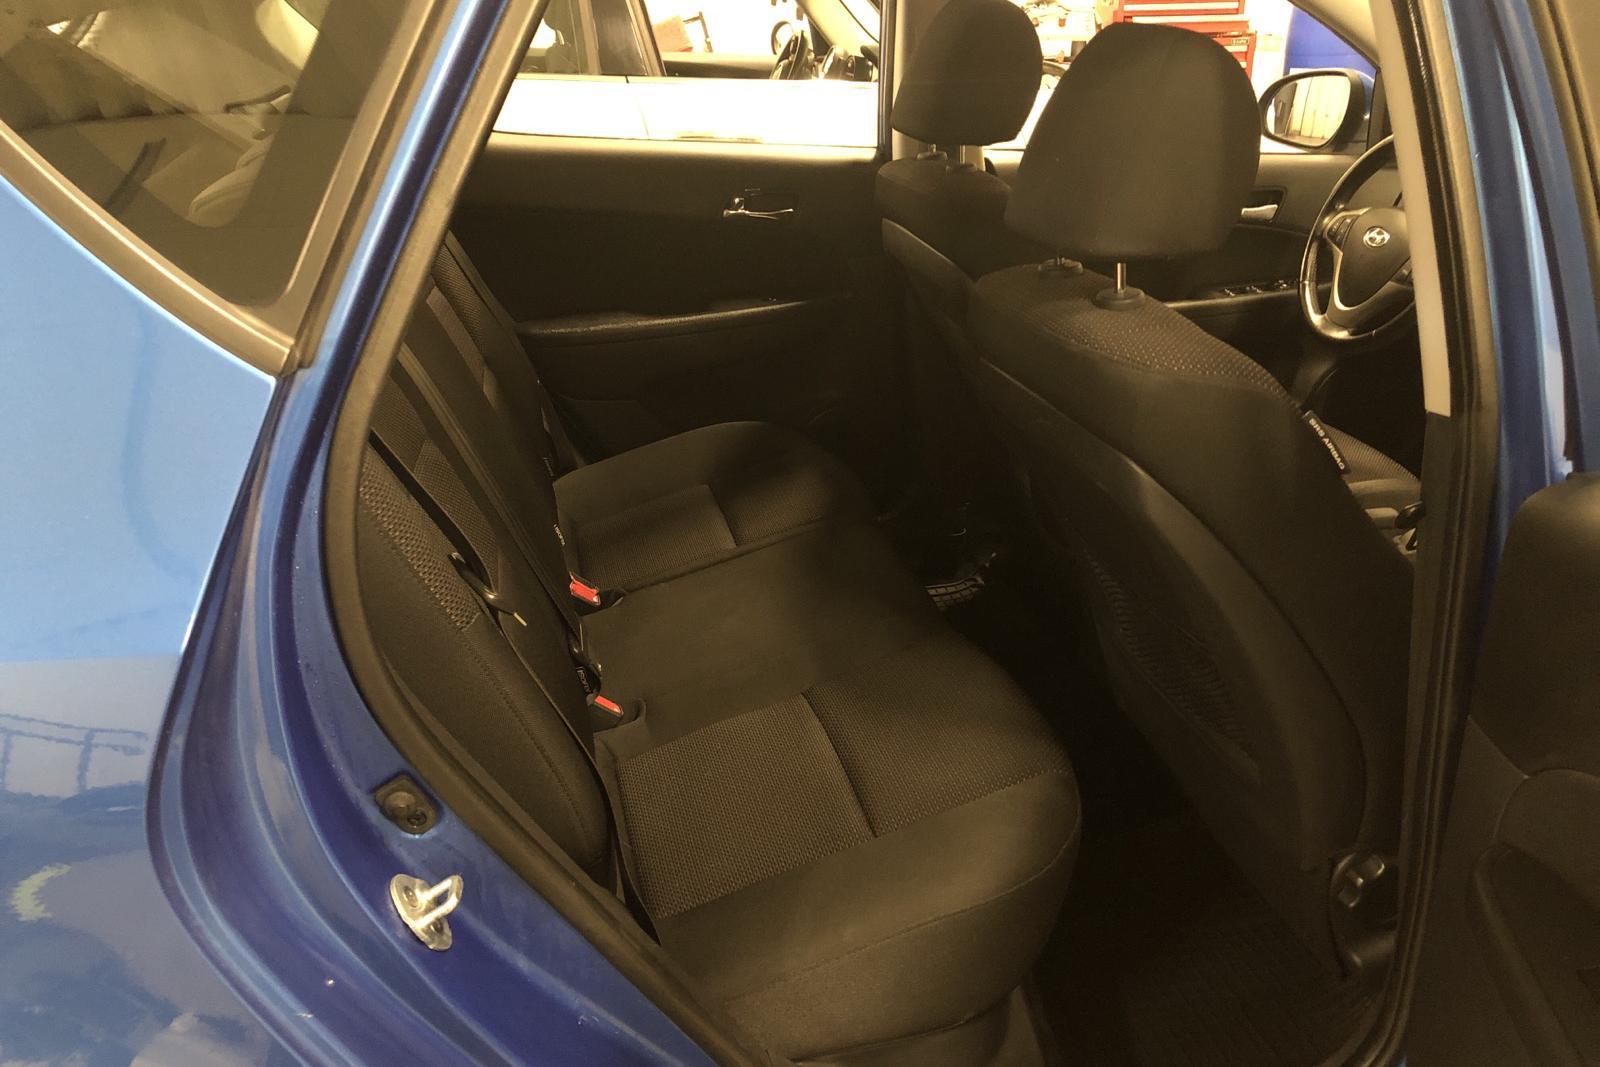 Hyundai i30 1.6 CRDi 5dr (115hk) - 136 360 km - Manual - blue - 2010